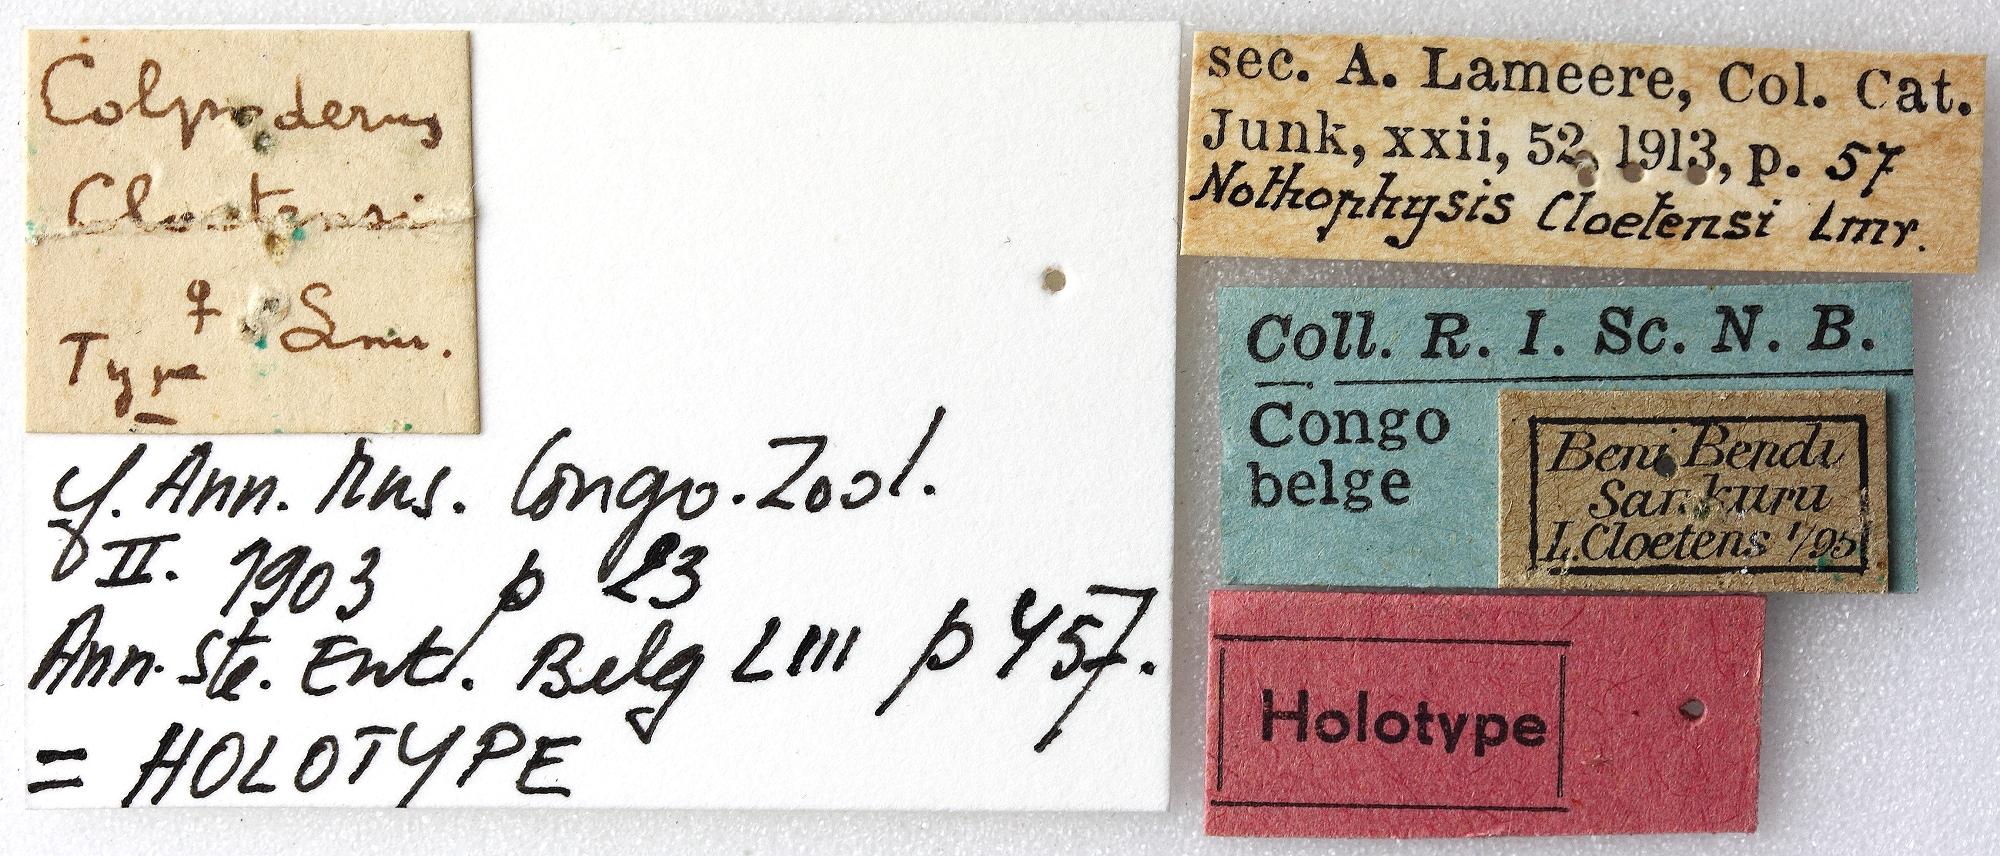 Notophysis cloetensi 01 00 Holotype F 040 BRUS 201405.jpg